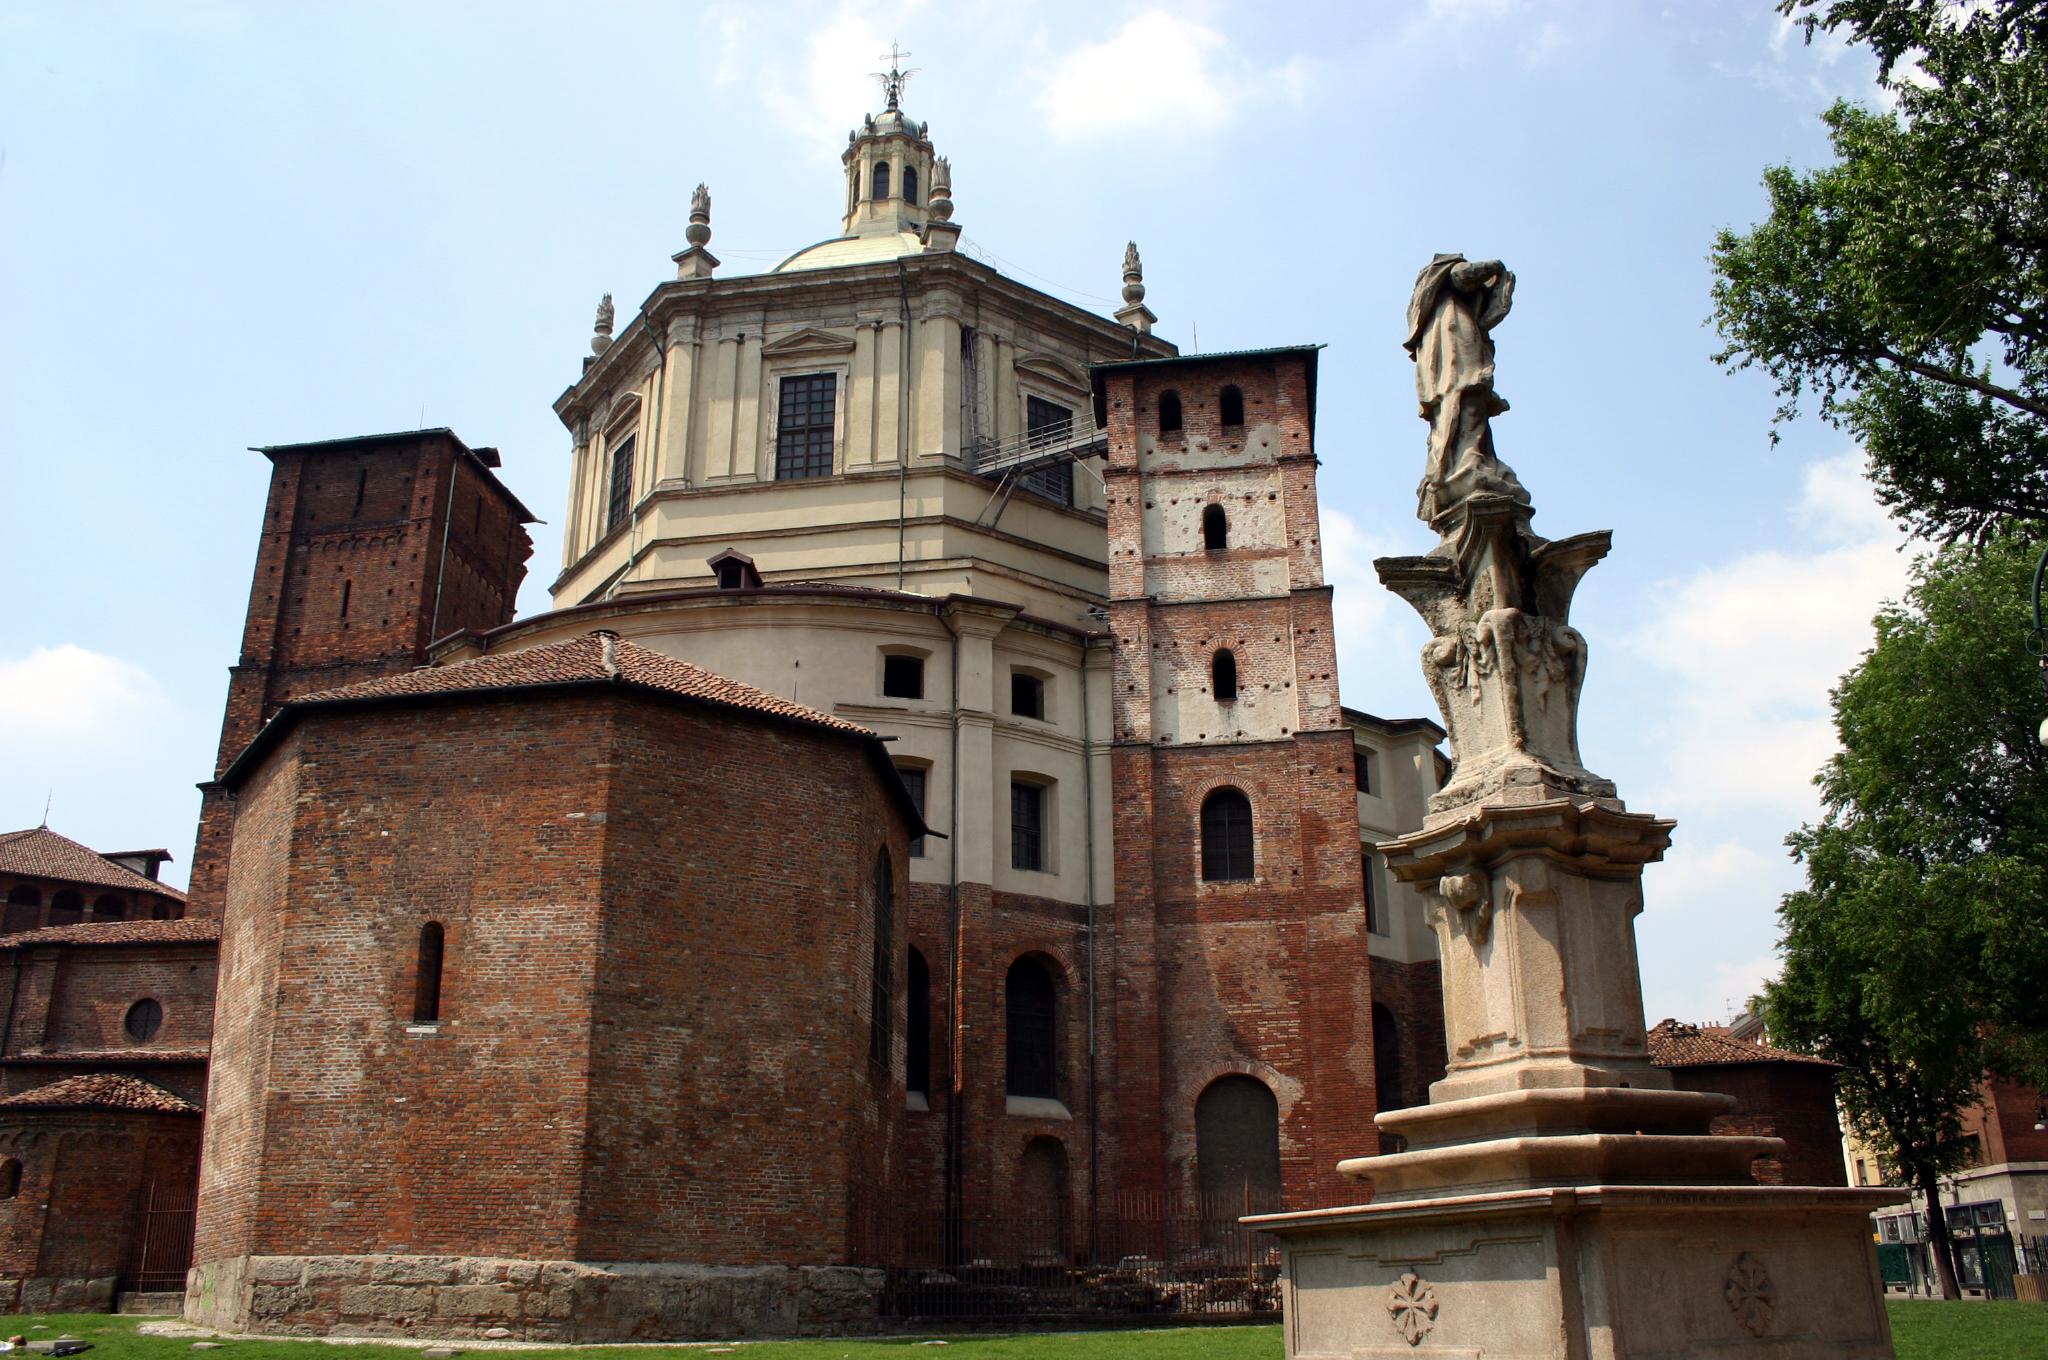 http://upload.wikimedia.org/wikipedia/commons/0/07/1568_-_Milano_-_Absidi_di_san_Lorenzo_-_Foto_Giovanni_Dall%27Orto_-_18-May-2007.jpg